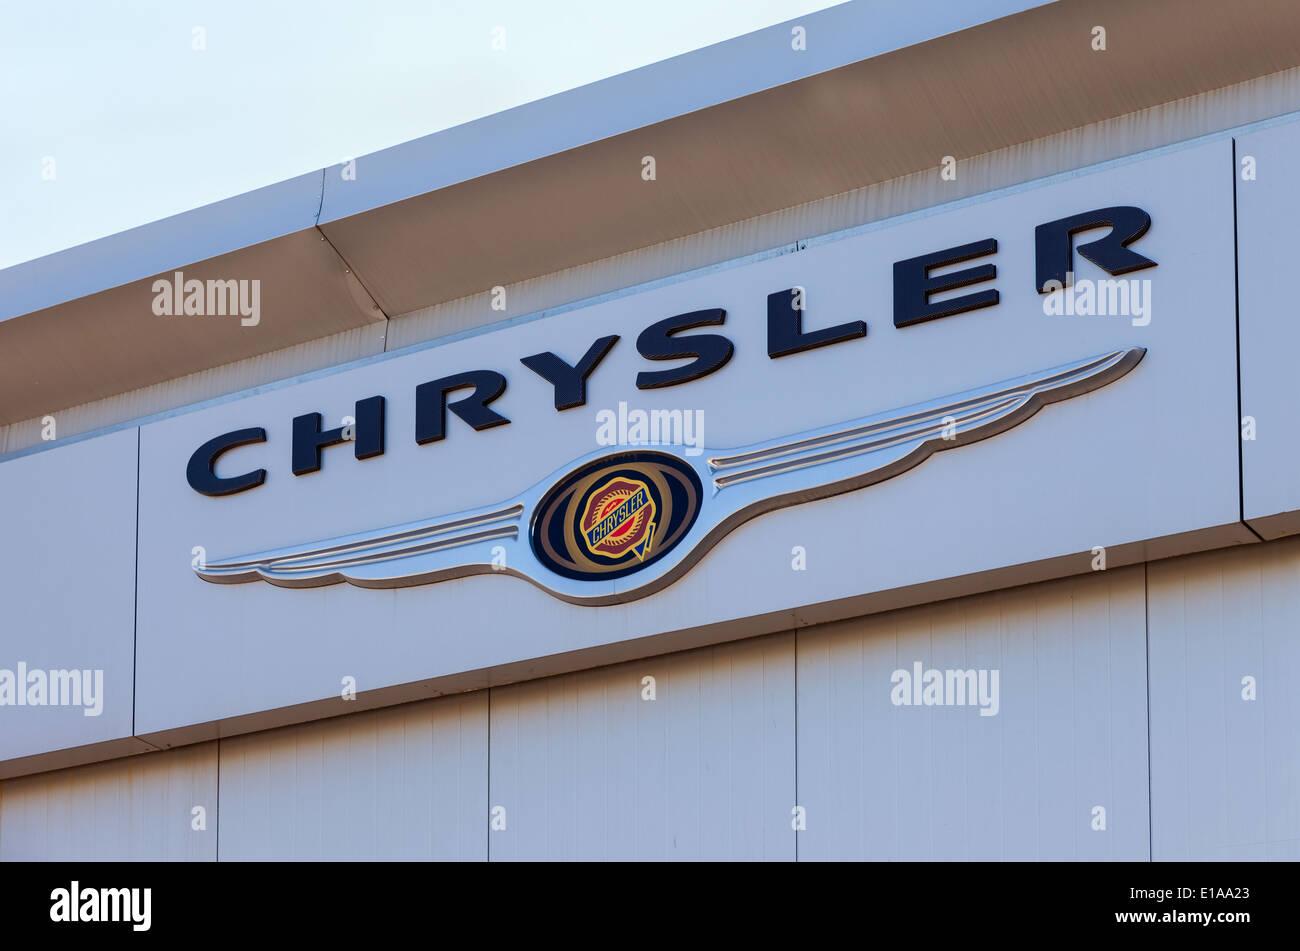 Chrysler automobile dealership sign stock photo 69683547 alamy chrysler automobile dealership sign biocorpaavc Choice Image